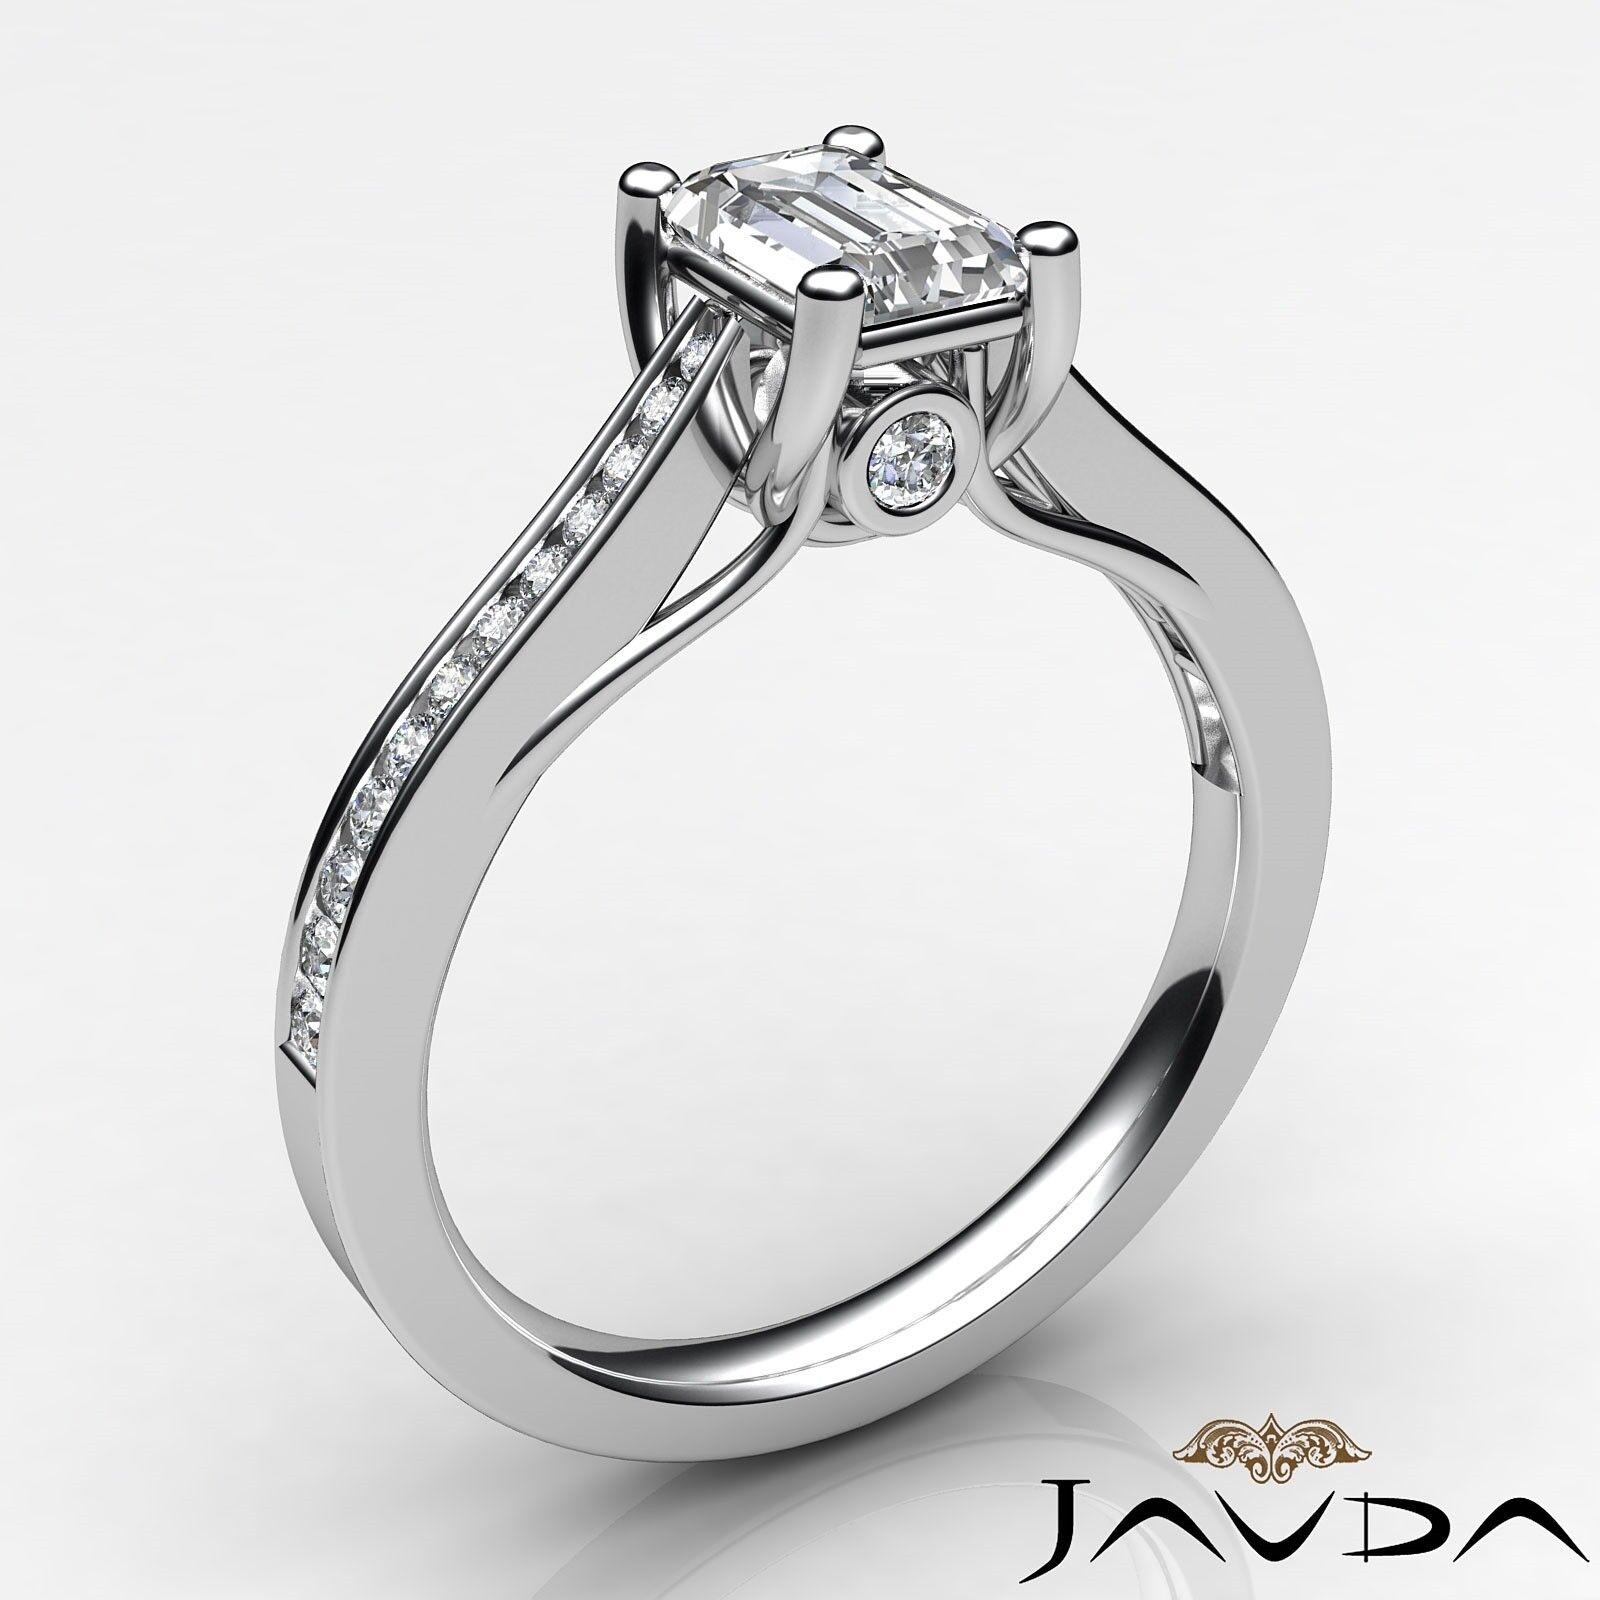 1.32ctw Channel Set Shank Emerald Diamond Engagement Ring GIA F-VVS2 White Gold 1